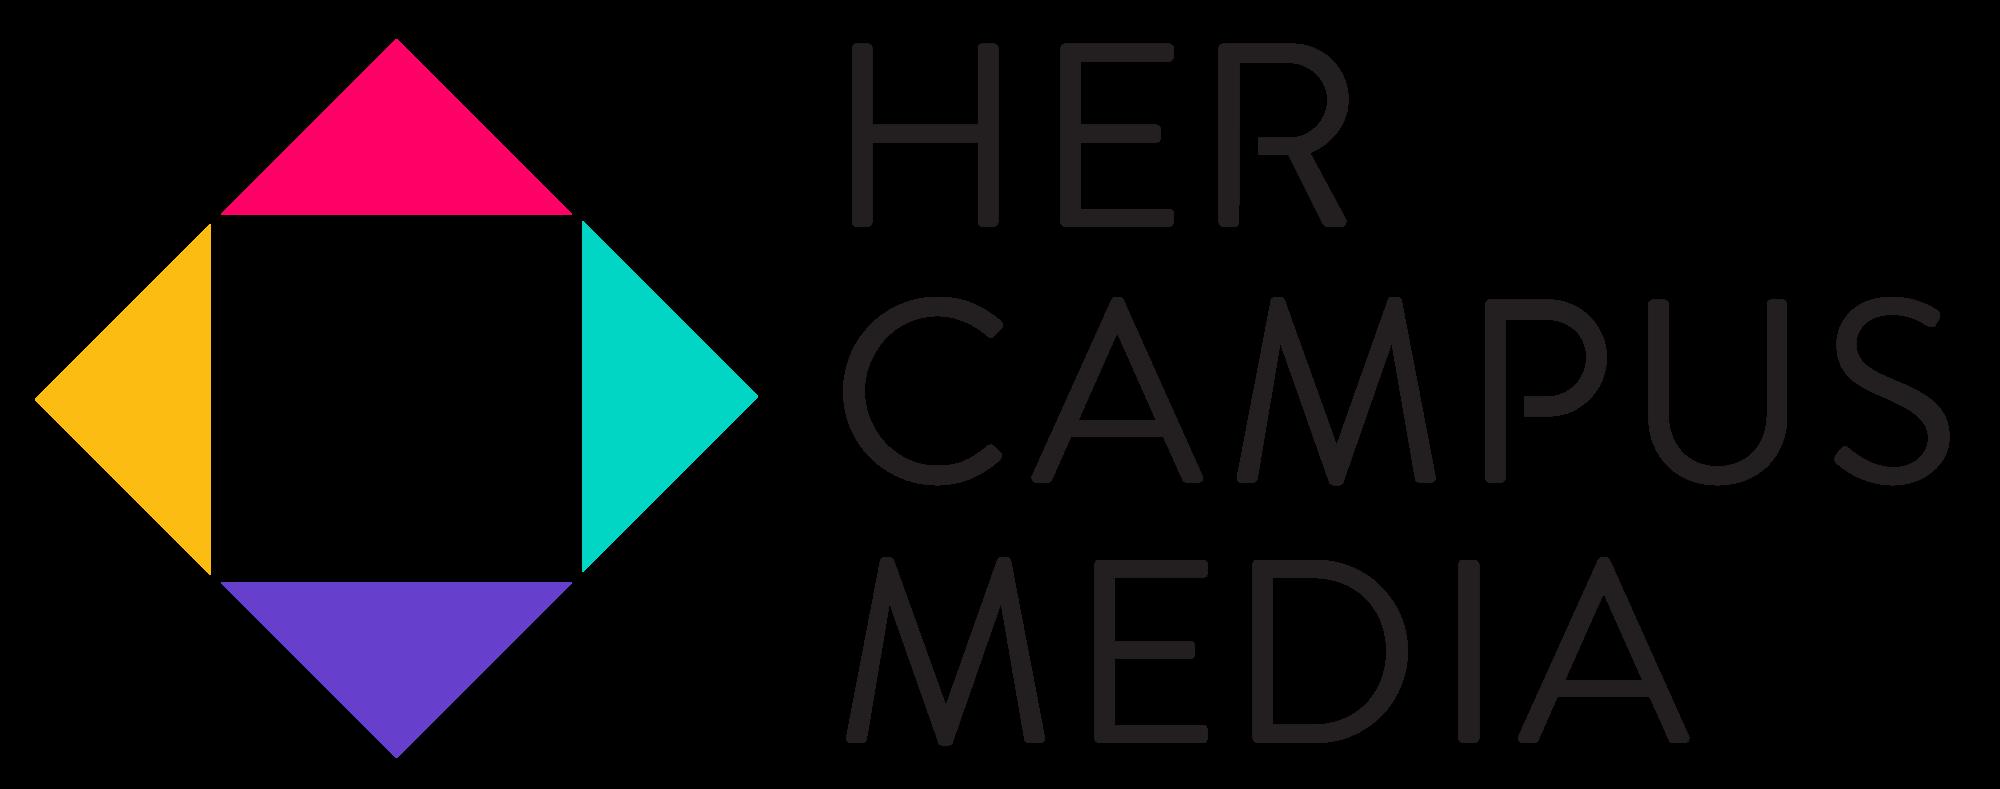 Her Campus Media 2016 Logo.png